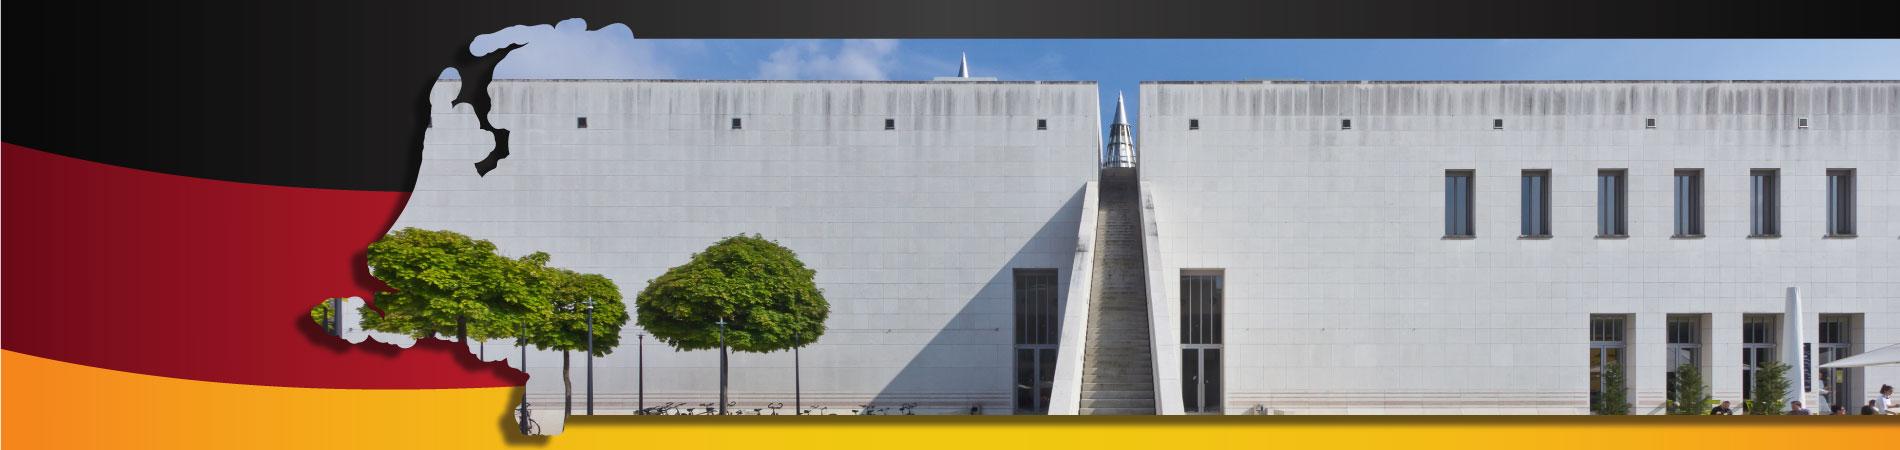 Bonn Kunst ausstellunghalle